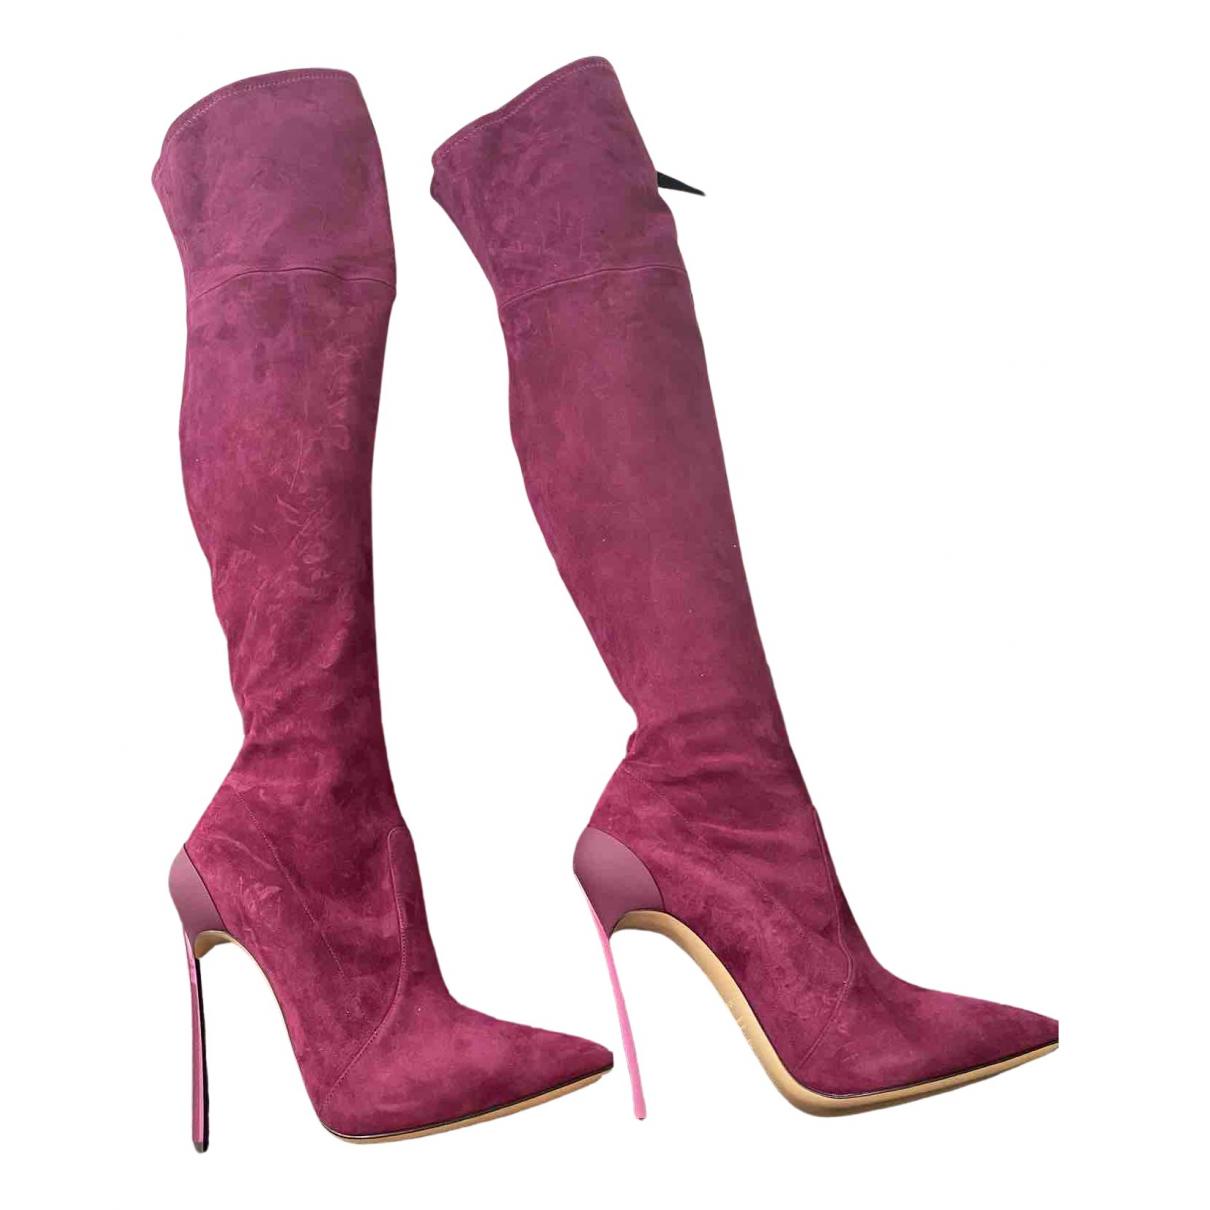 Casadei N Suede Boots for Women 37.5 EU